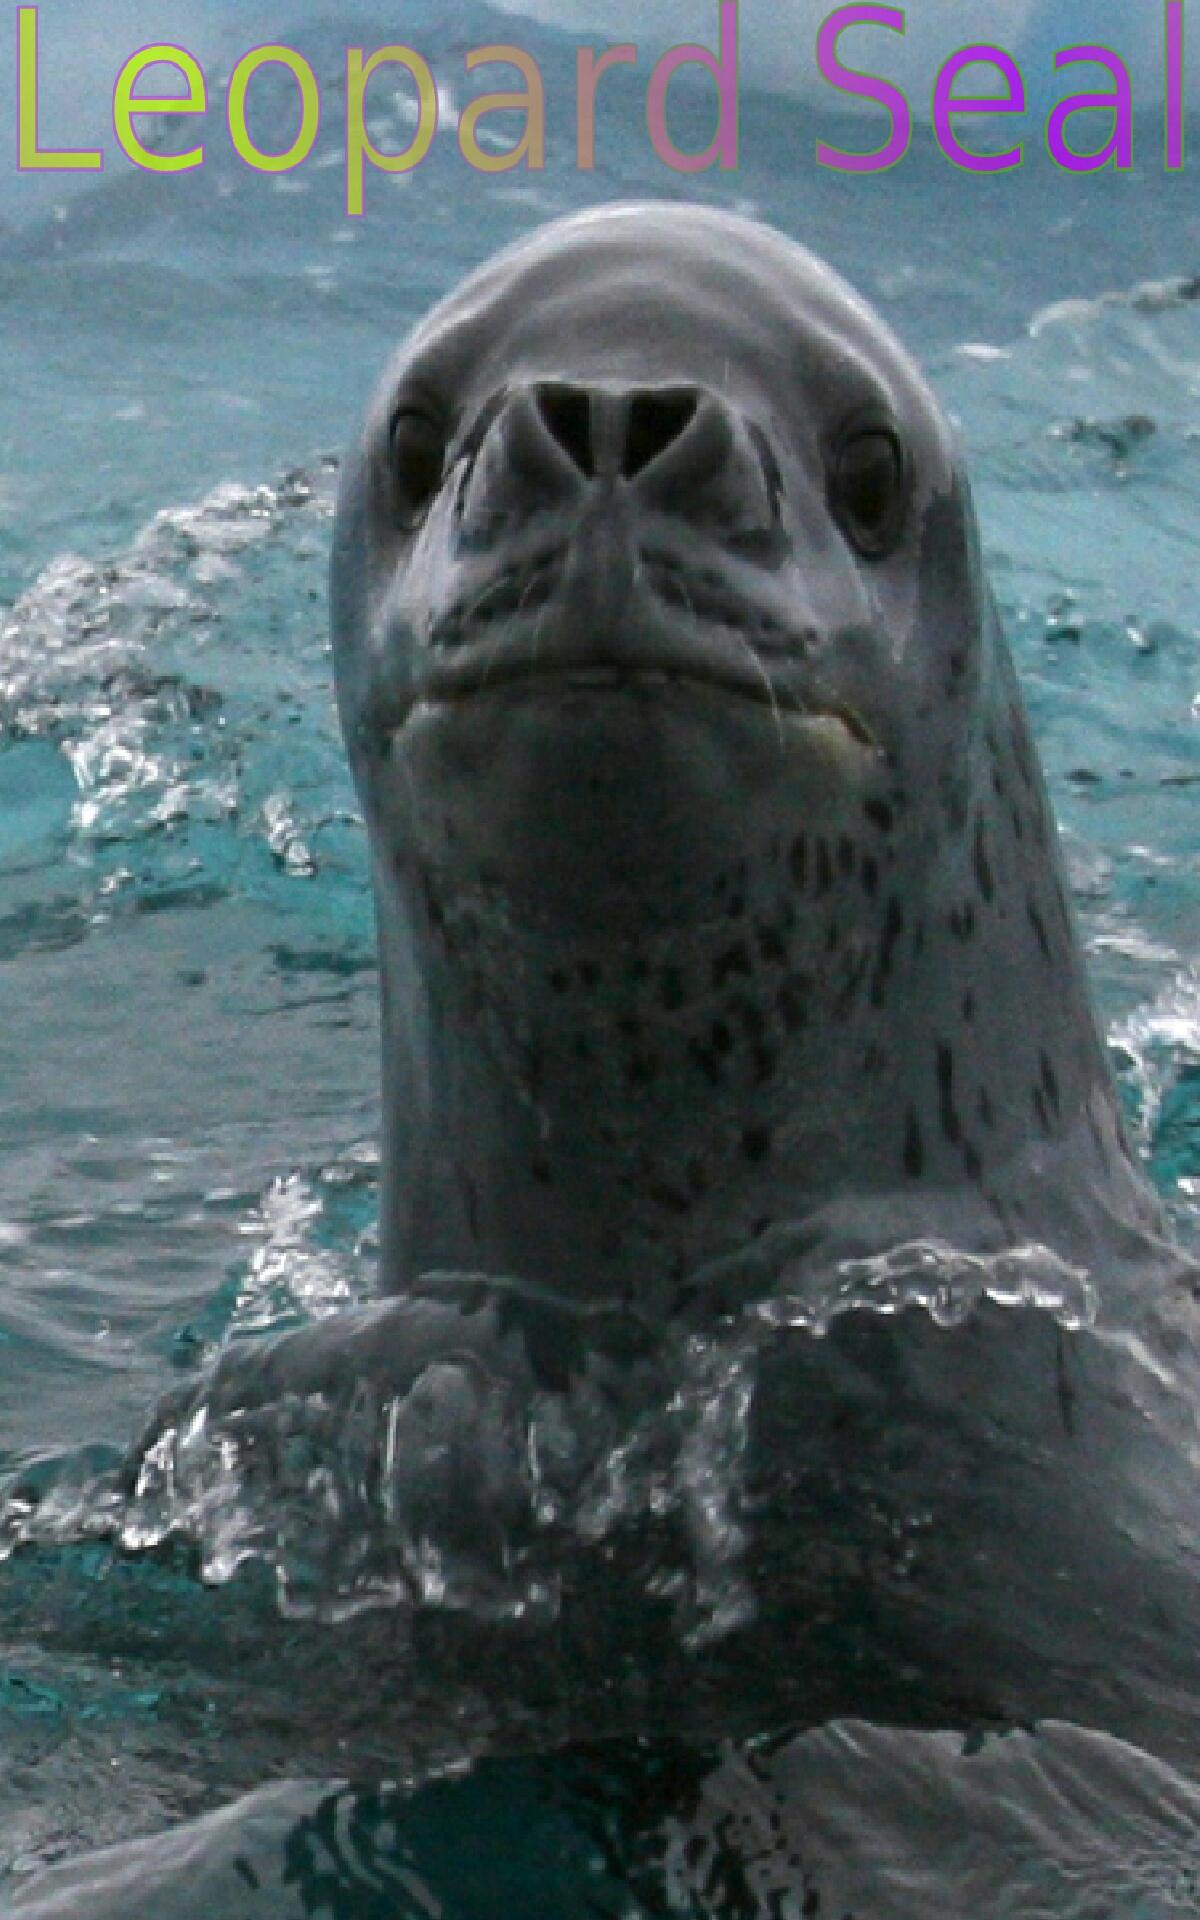 Amazon.com: Wild Animals of Antarctica 1: Appstore for Android